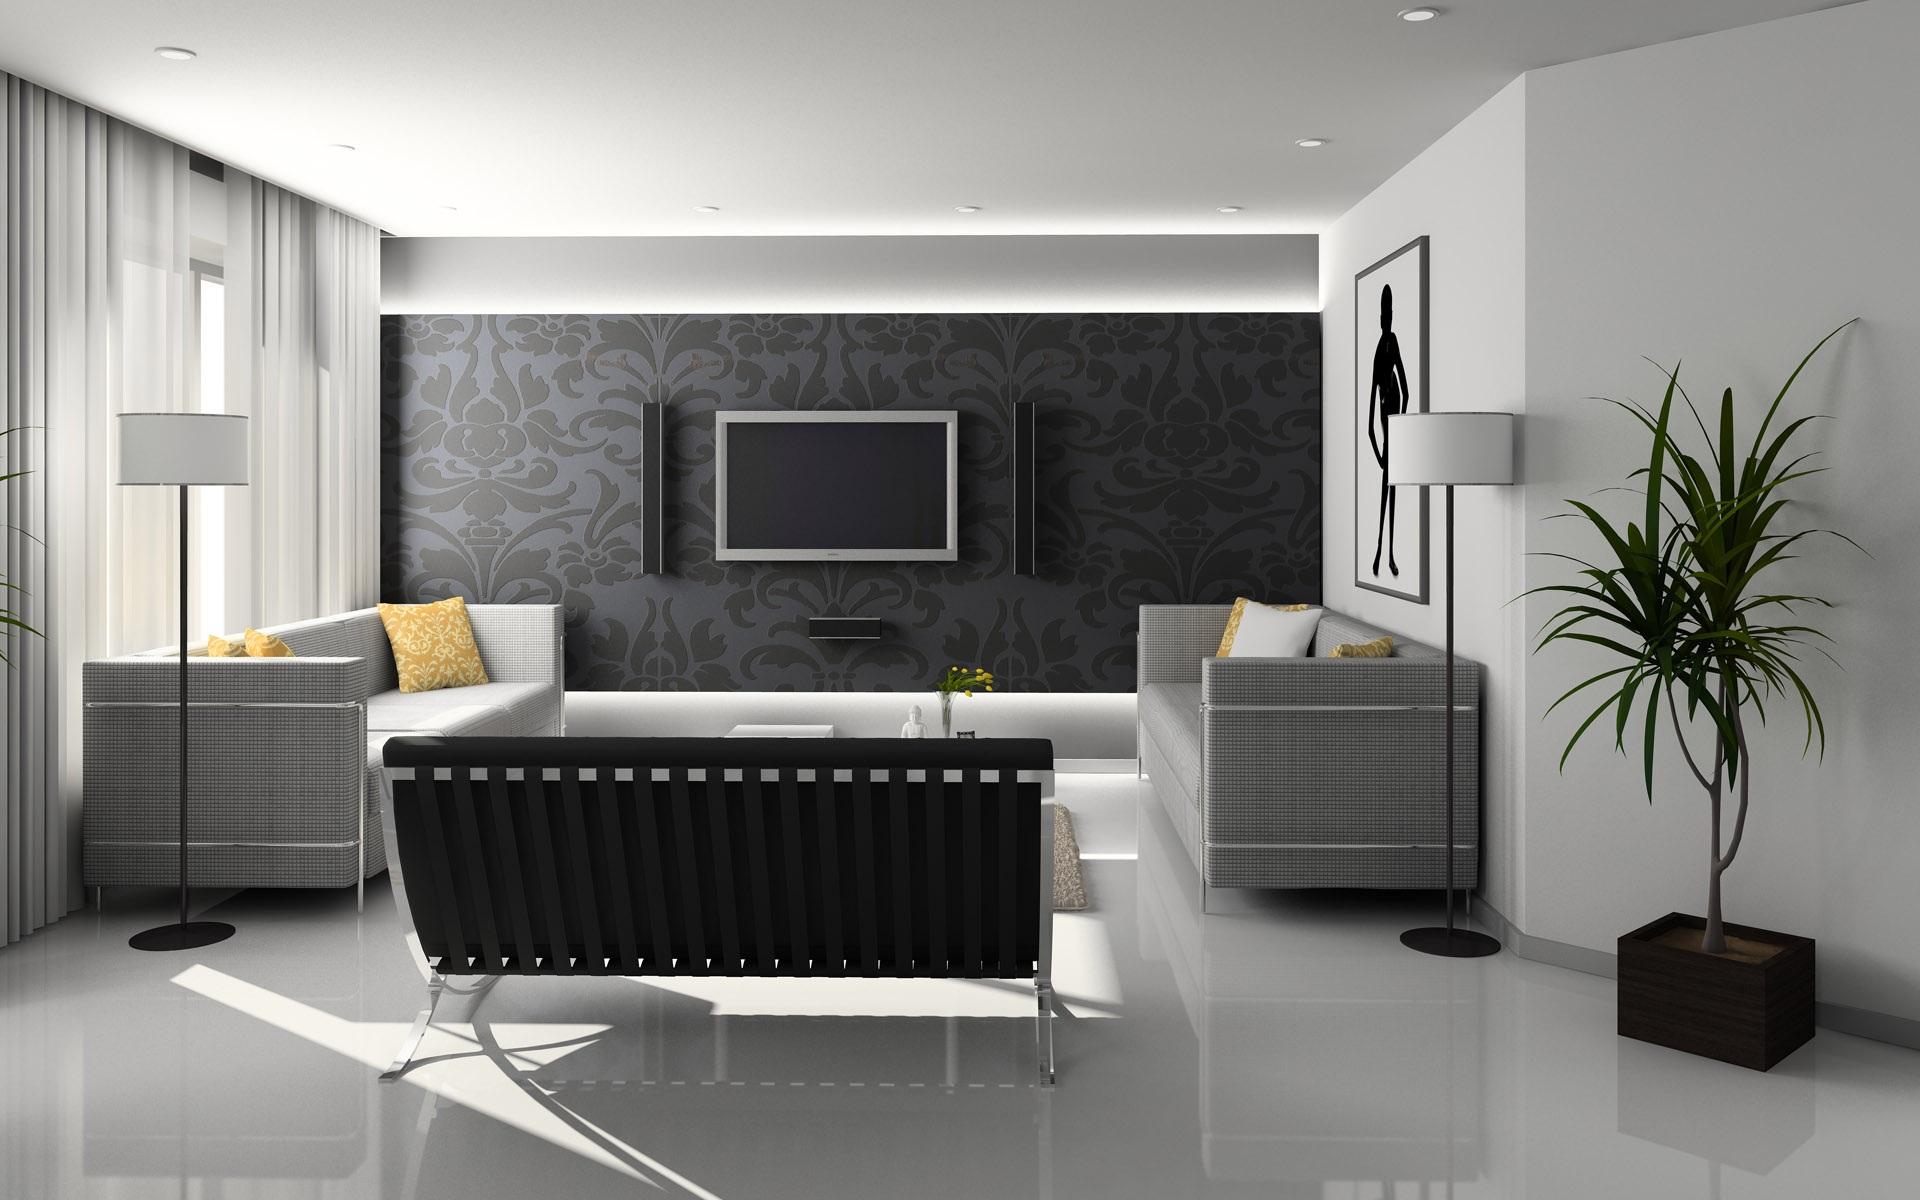 Flat Screen Monitor on Wall Near Sofa Set. Pixabay. Interior Design Of A  House